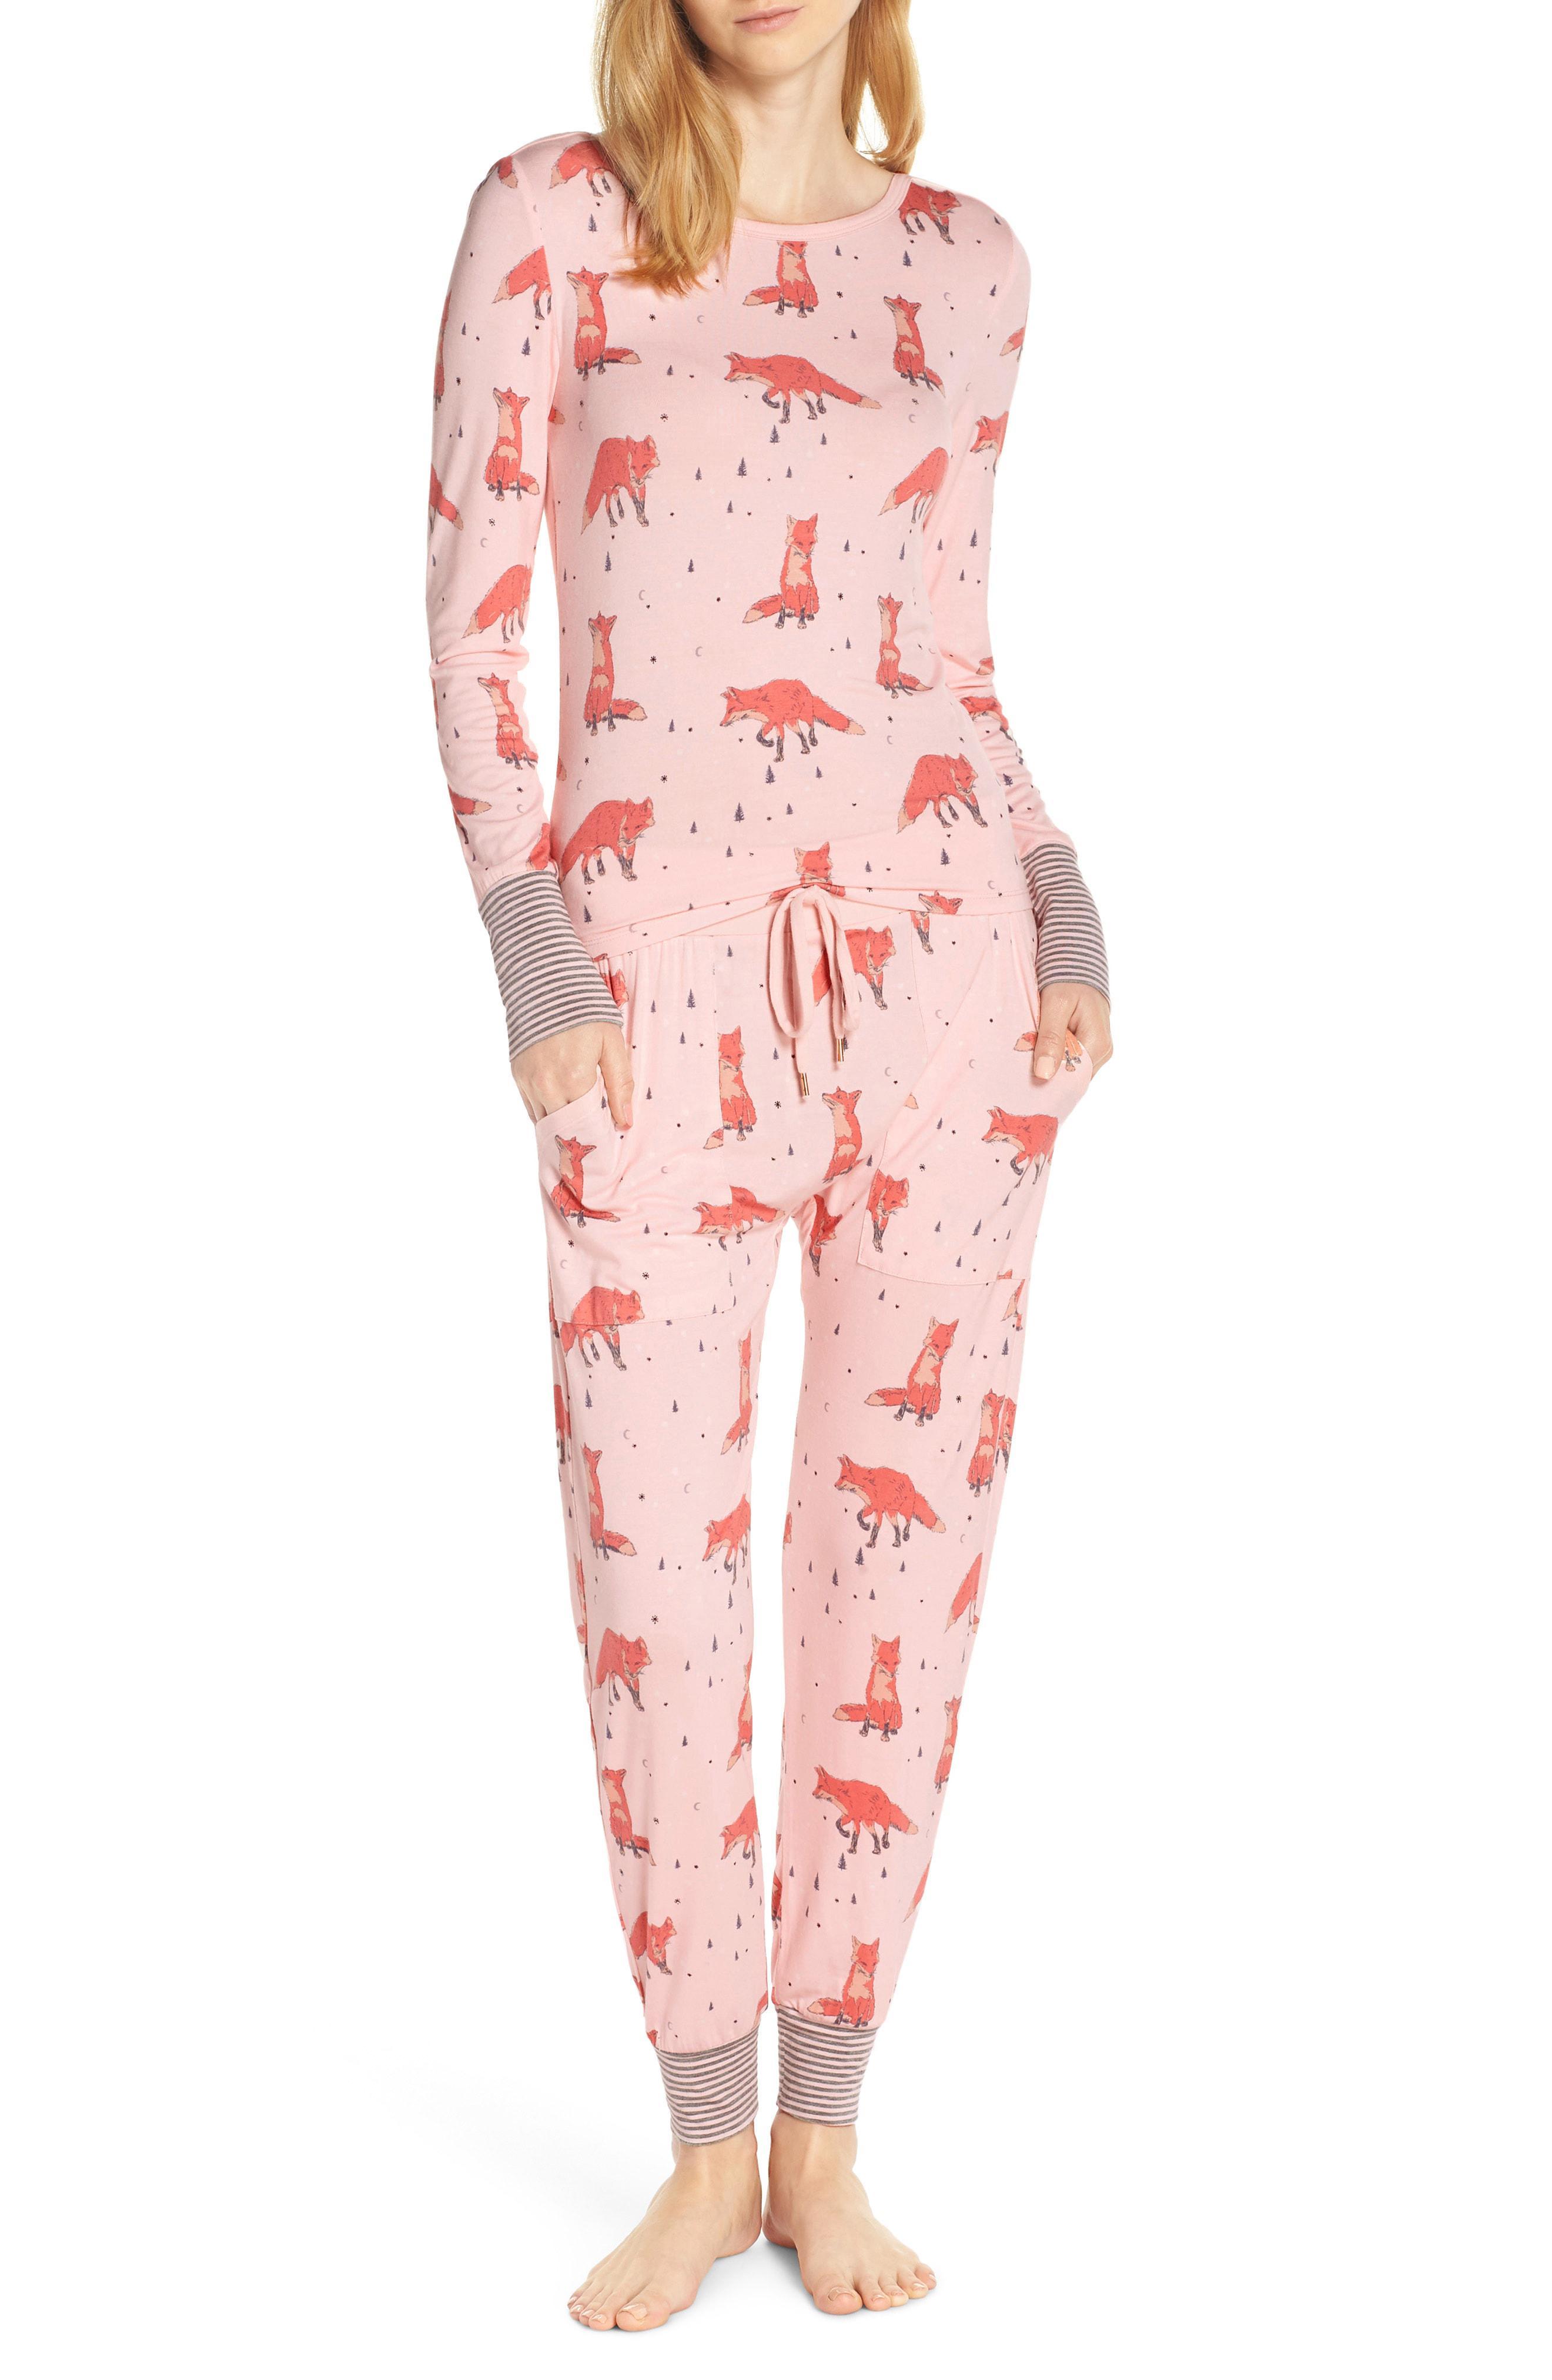 5b1309afadb6 Lyst - Honeydew Intimates Campfire Cutie Jersey Pajamas in Pink